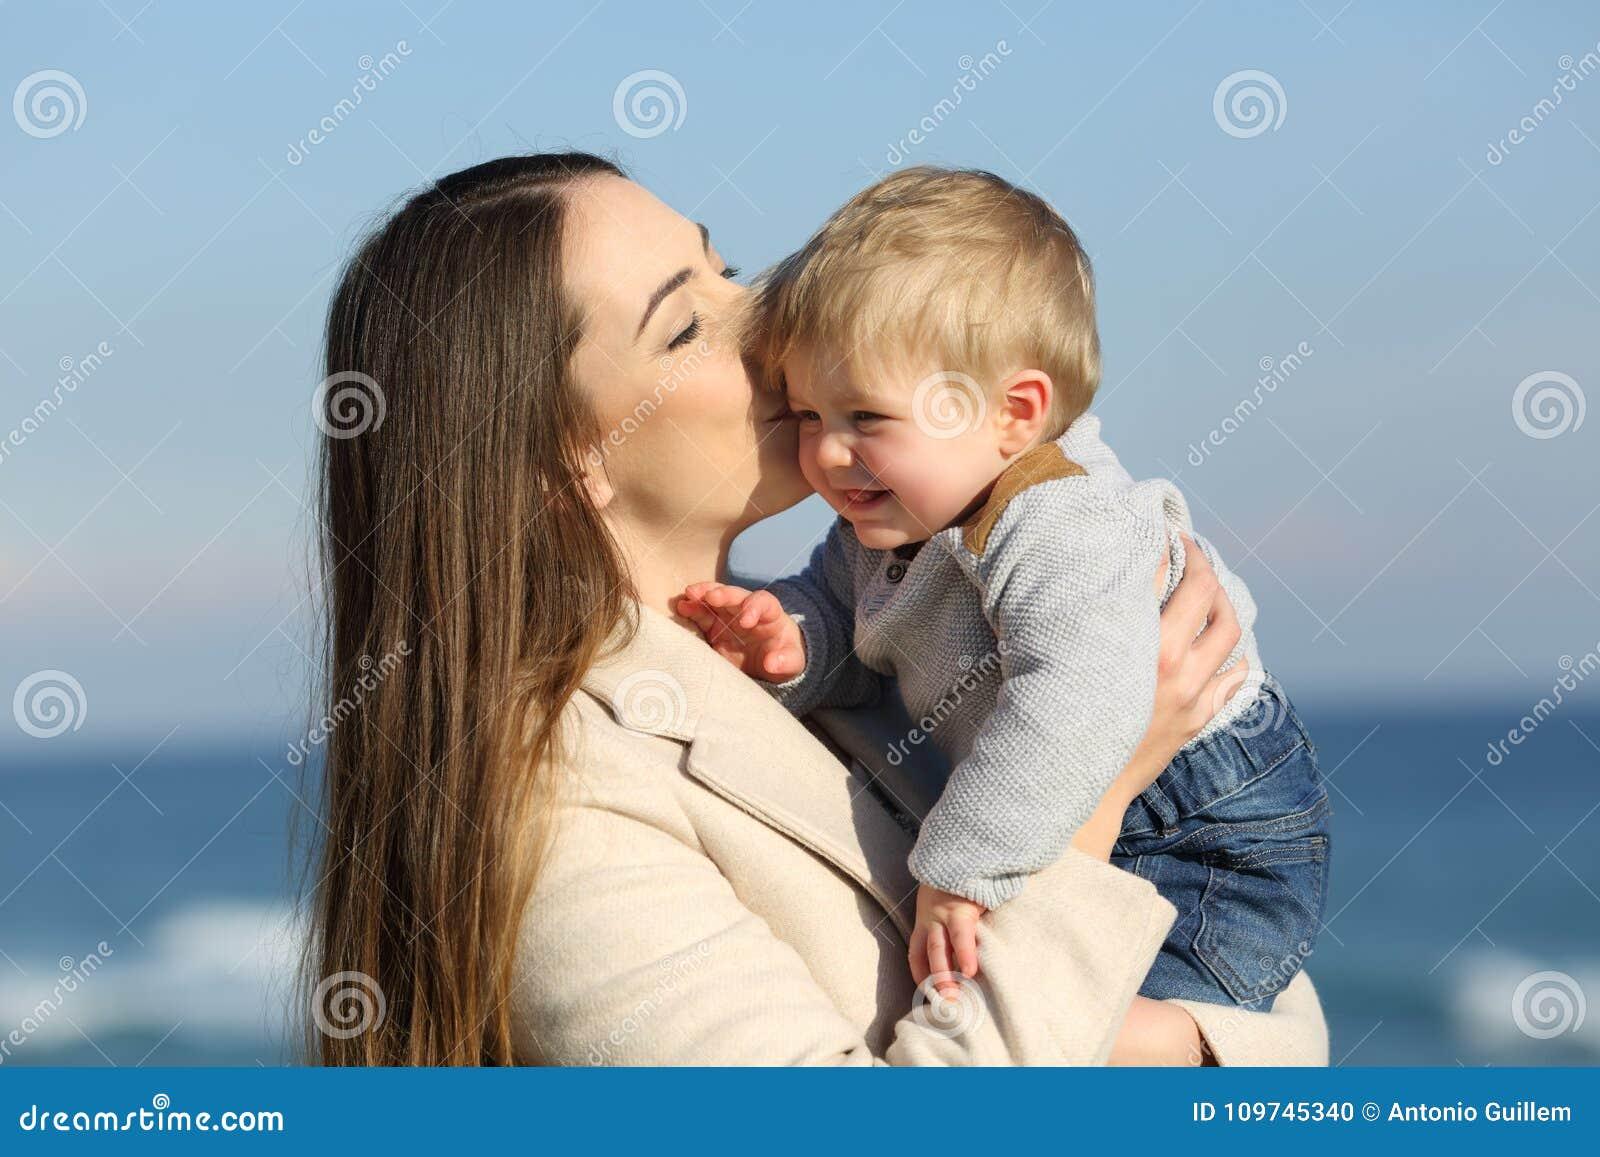 Men other mom kissing